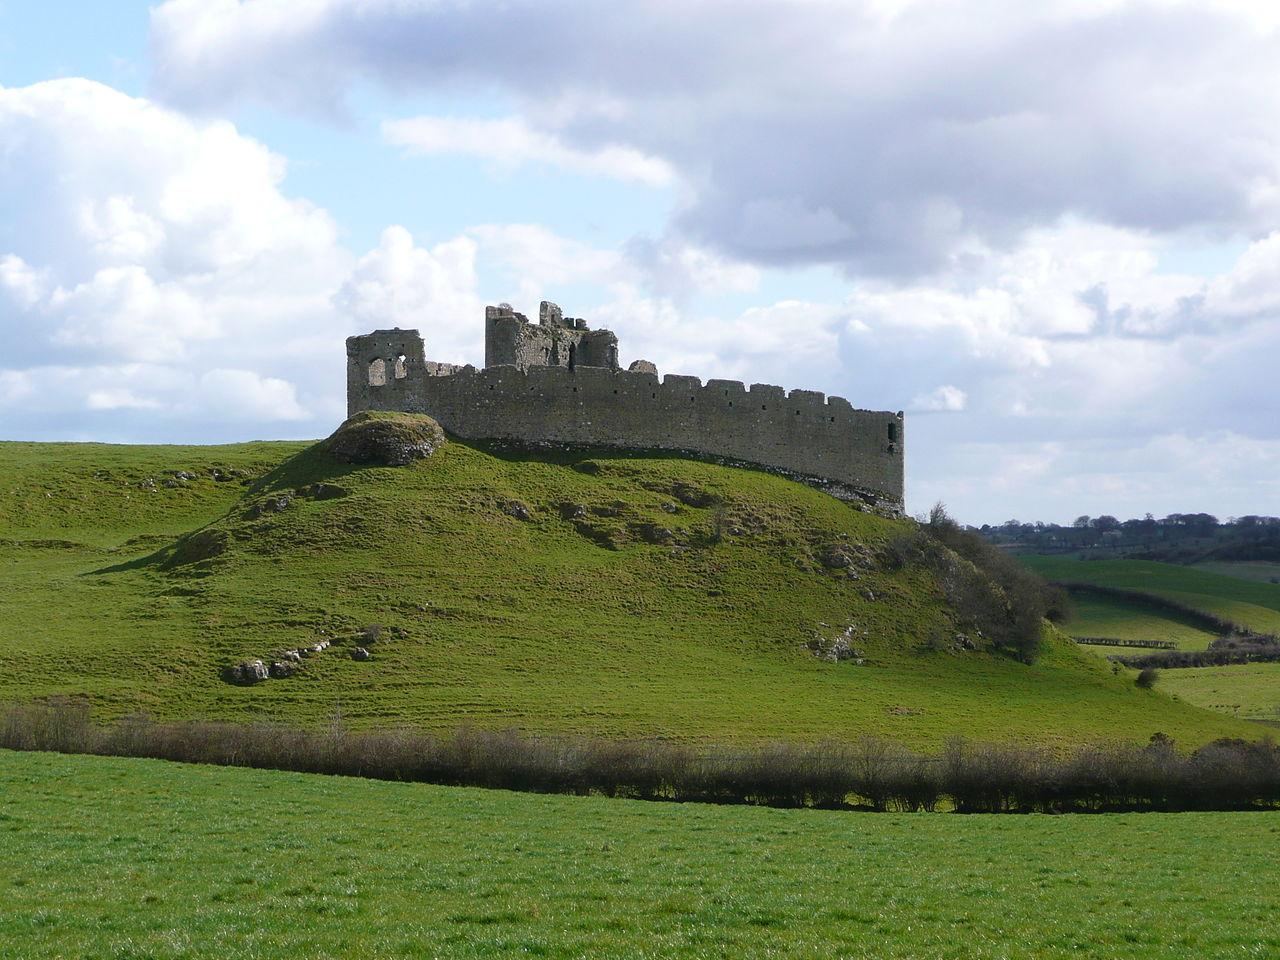 wide shot of castle roche on a hill